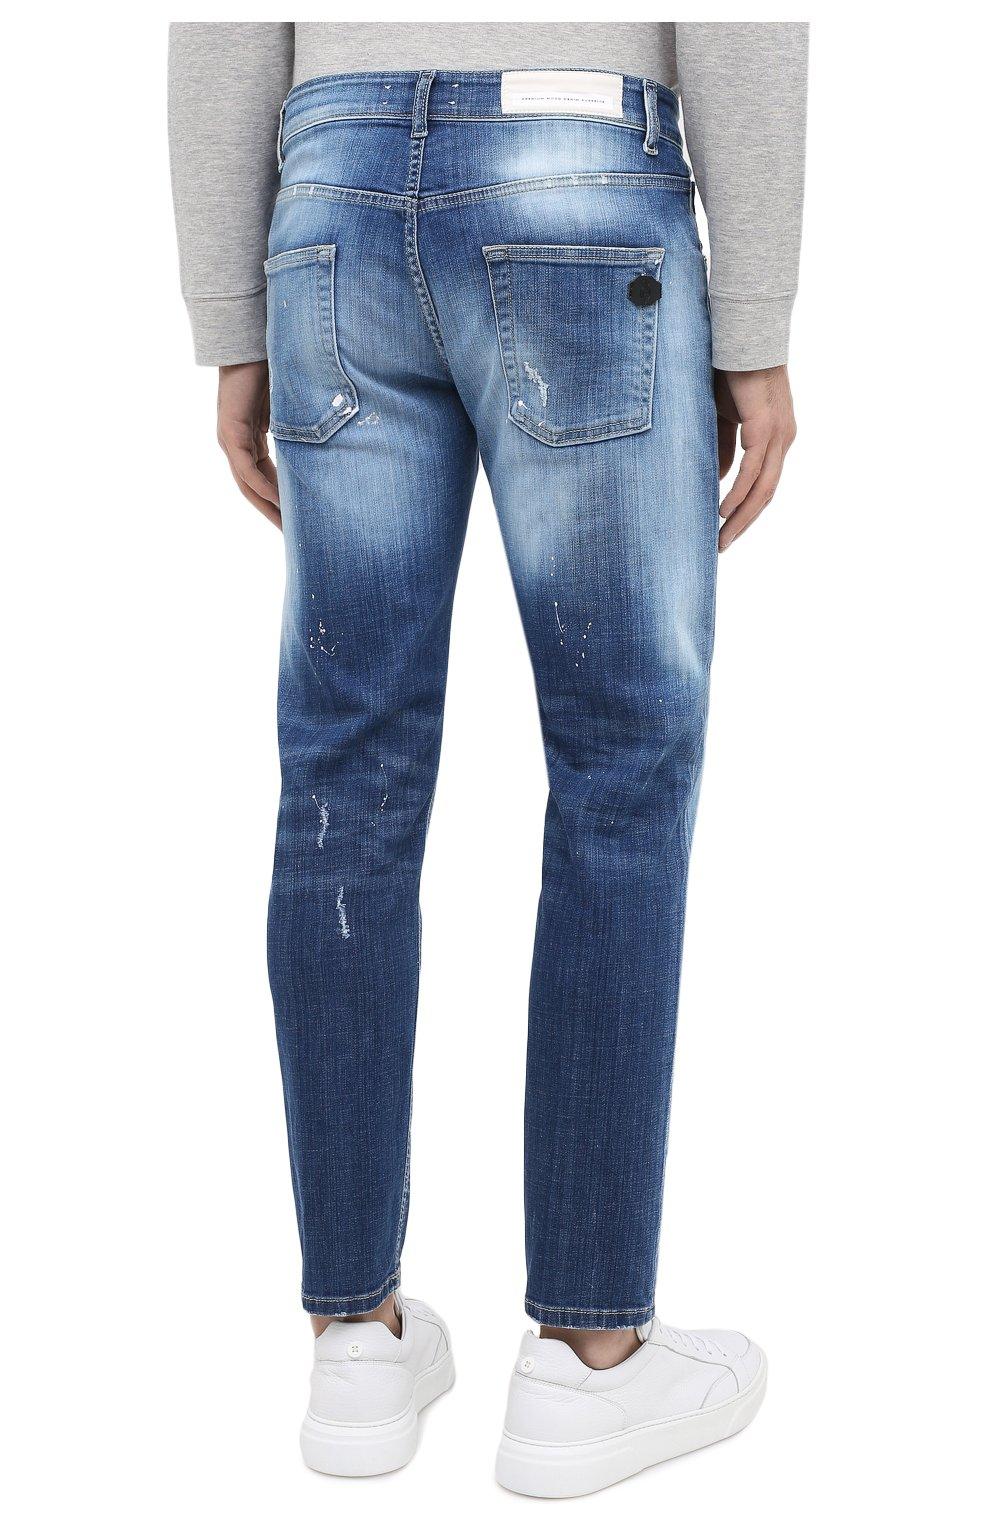 Мужские джинсы PREMIUM MOOD DENIM SUPERIOR синего цвета, арт. F21 310340025/PAUL   Фото 4